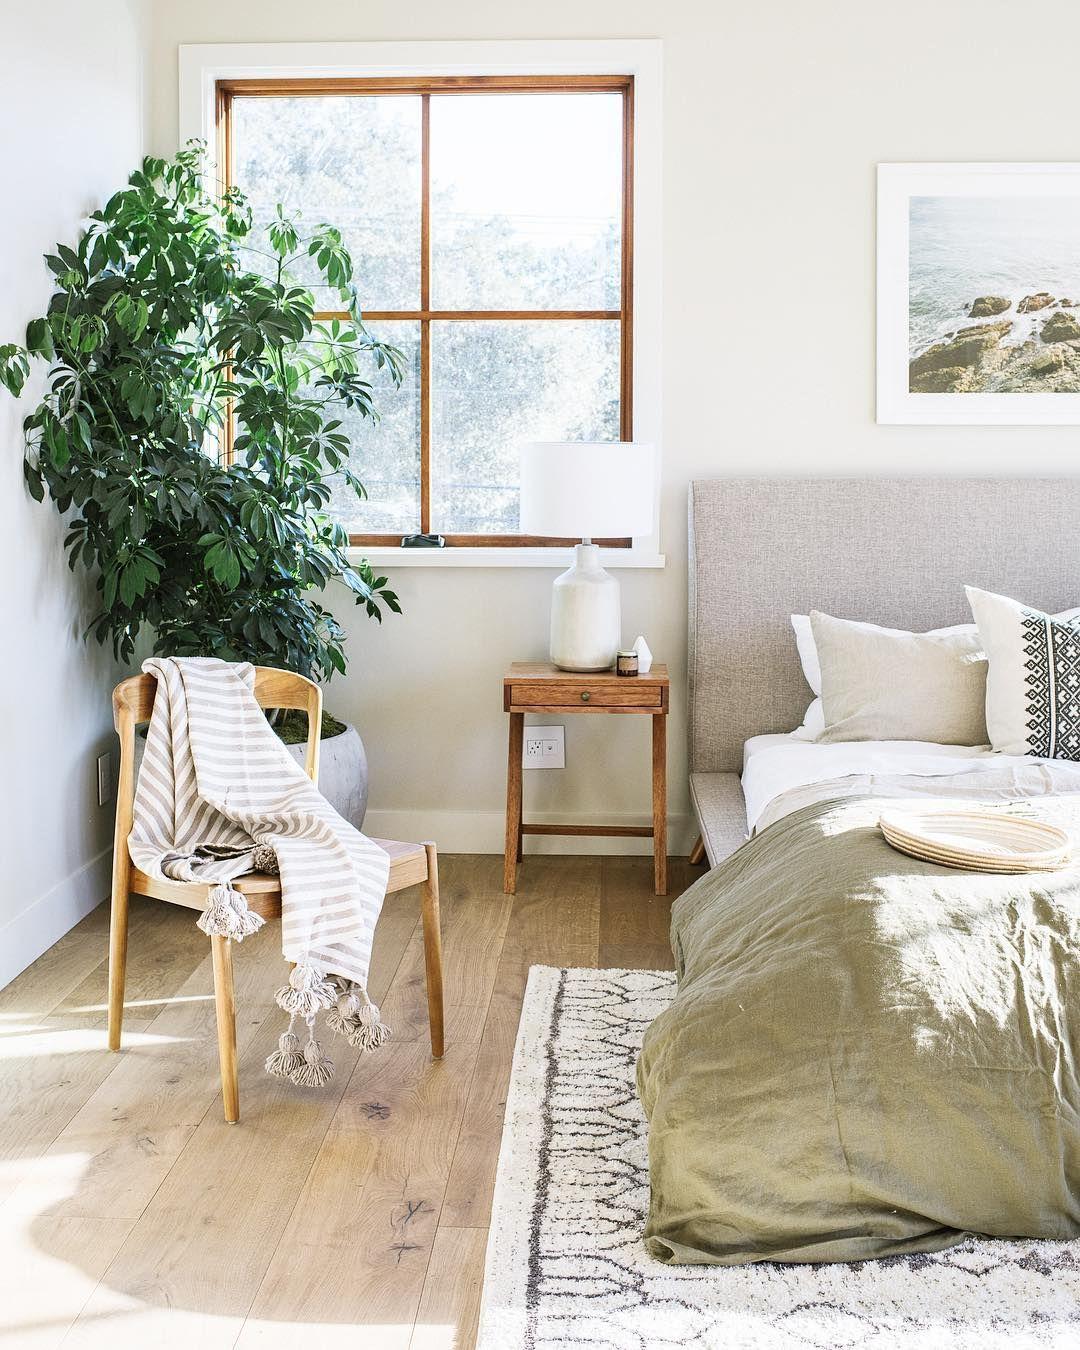 Earthy Fresh Bedroom Pinned By Www Youngandmerri Com Home Decor Bedroom Bedroom Interior Home Decor Cool bedroom ideas lonny